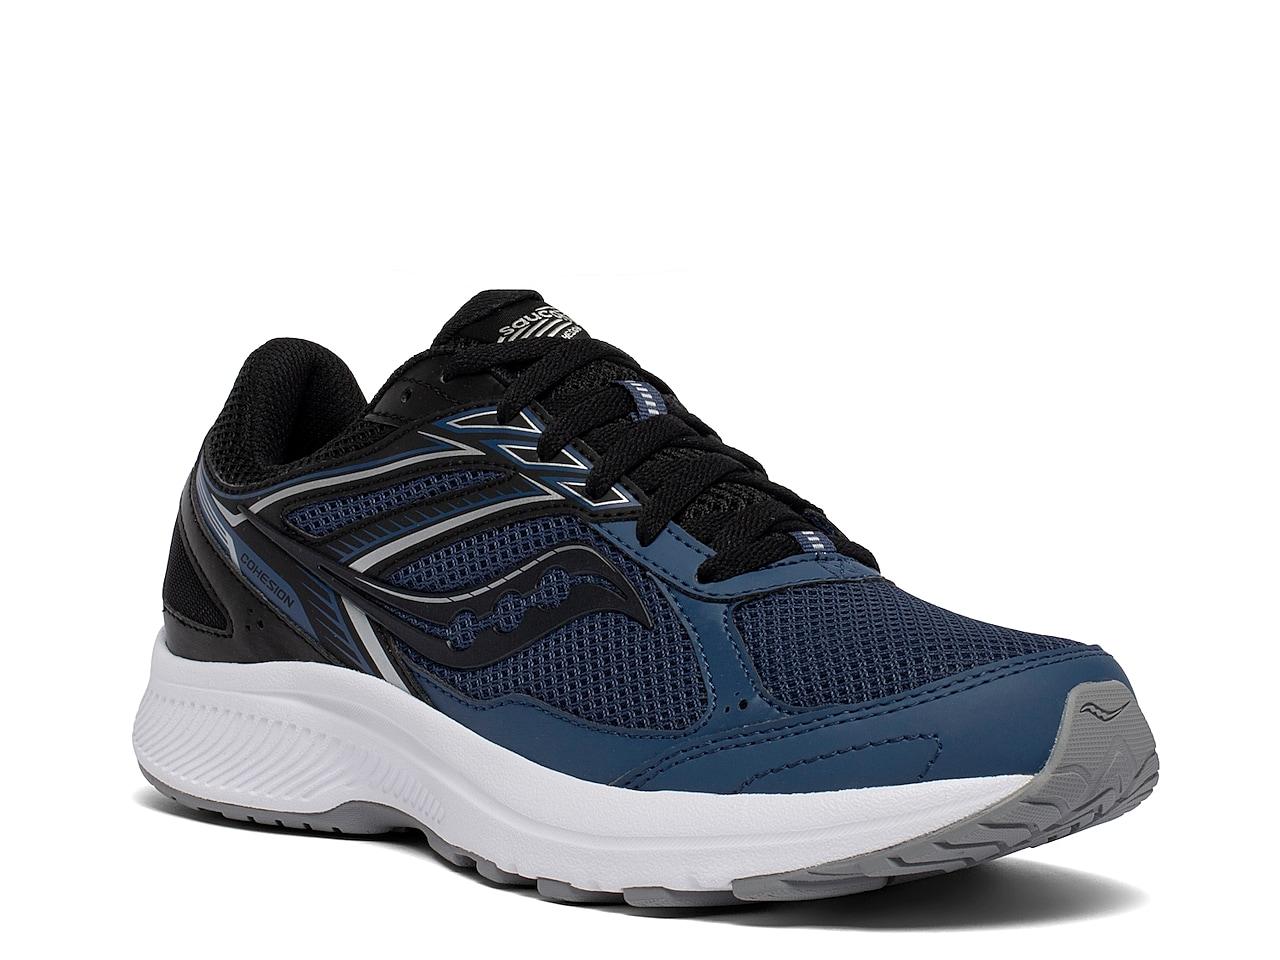 Cohesion 14 Running Shoe - Men's